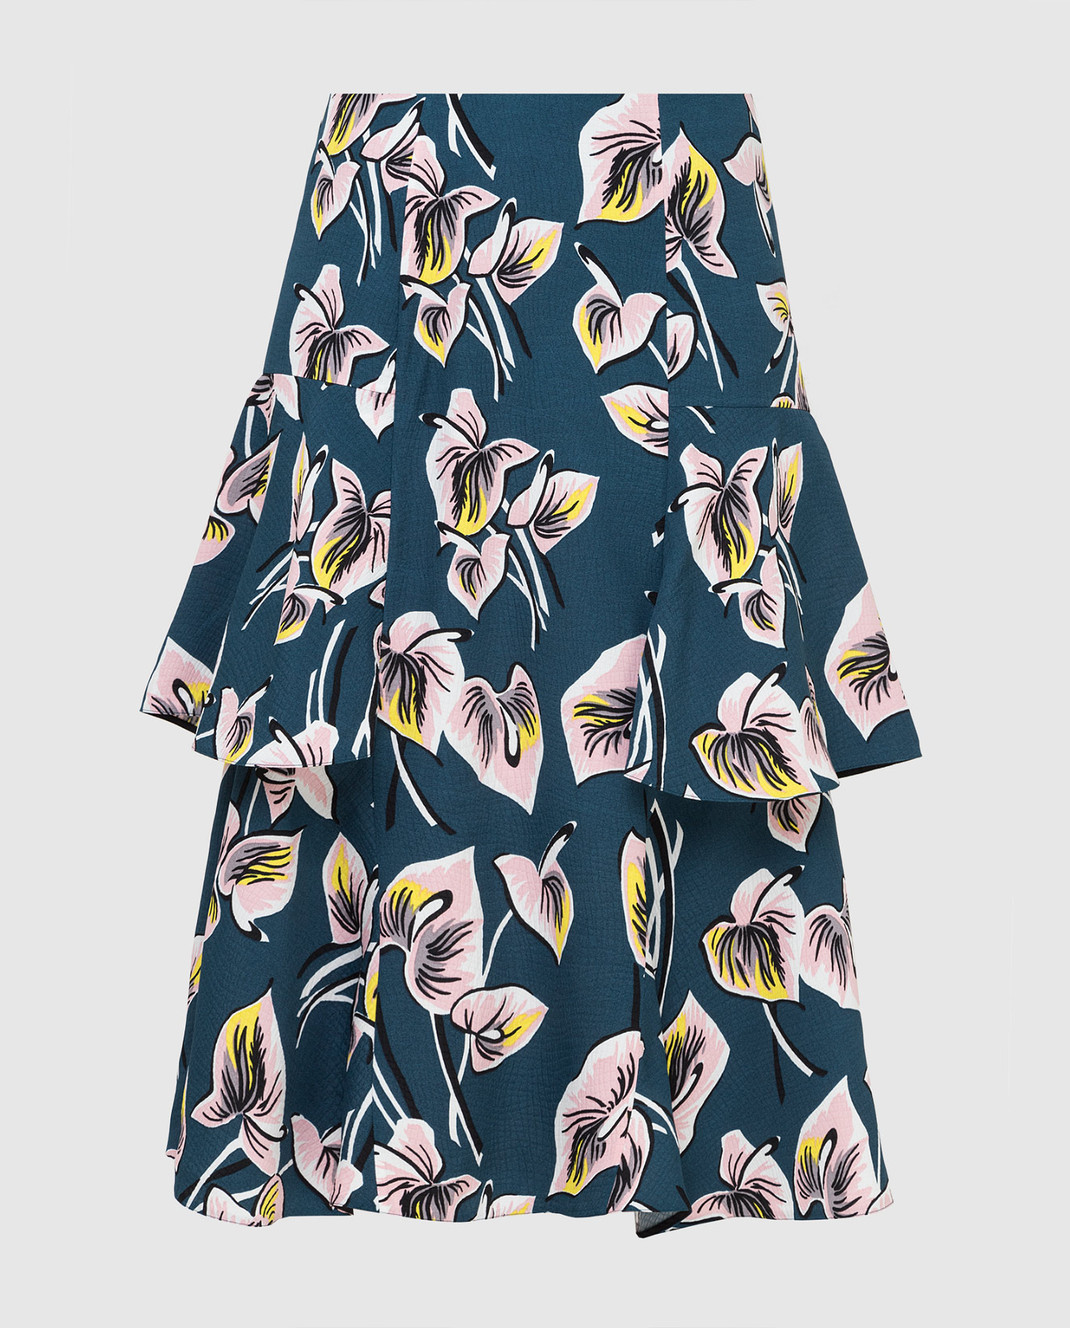 Marni Темно-бирюзовая юбка GOMAT39U00TV456